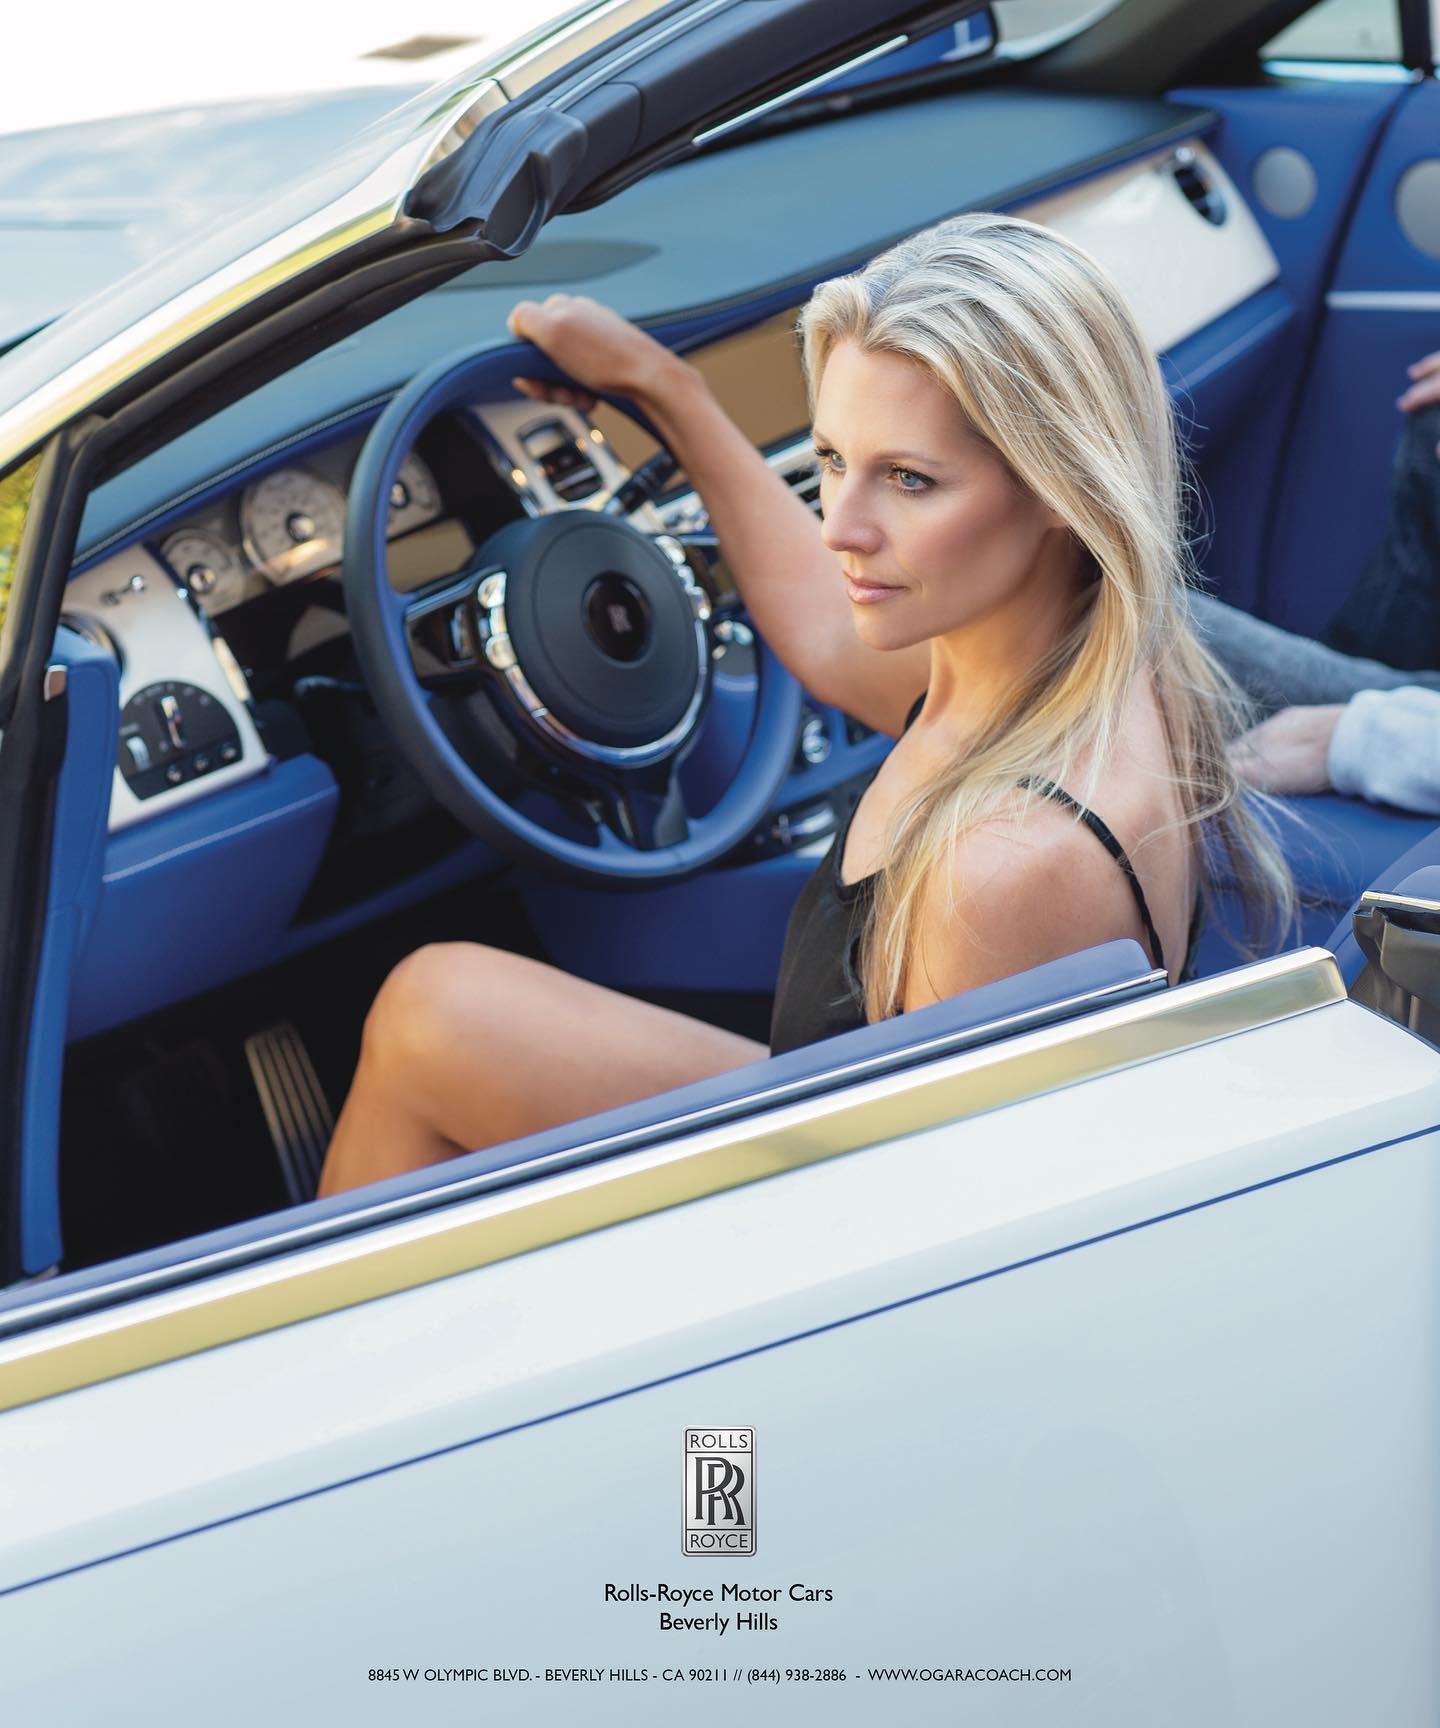 Rolls-Royce Advertisment